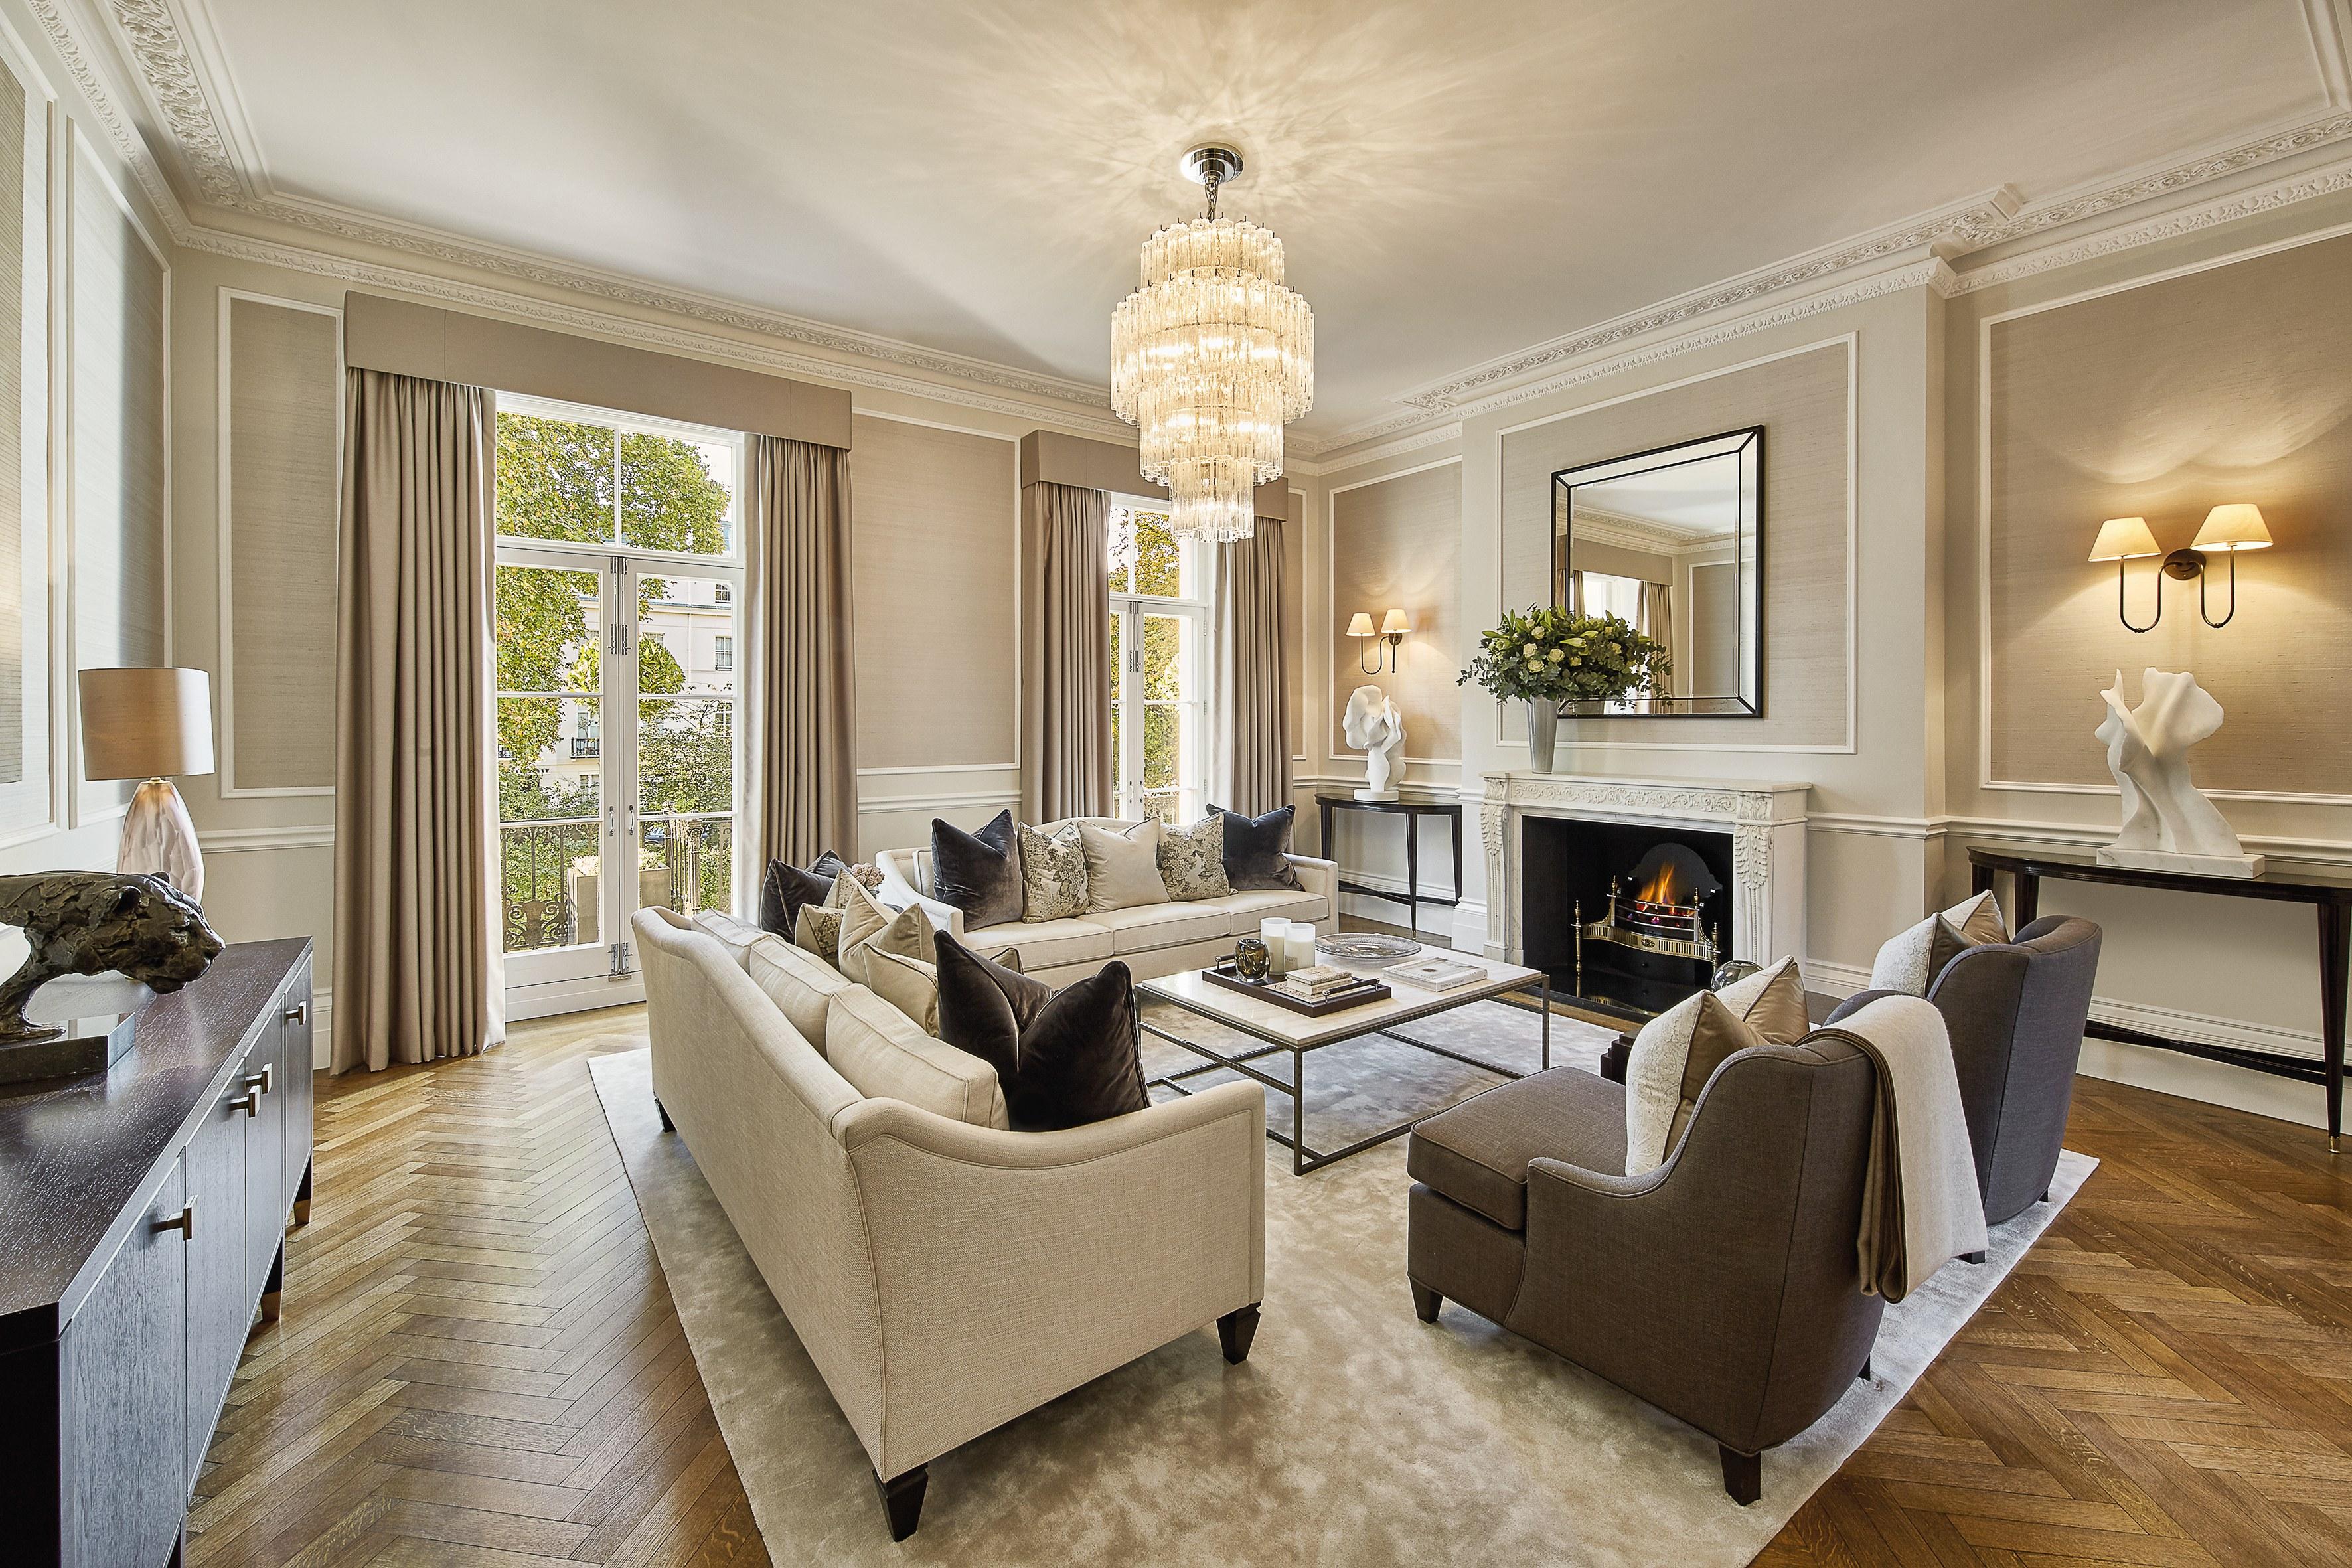 margaret-thatcher-georgian-style-estate-london-02.jpg